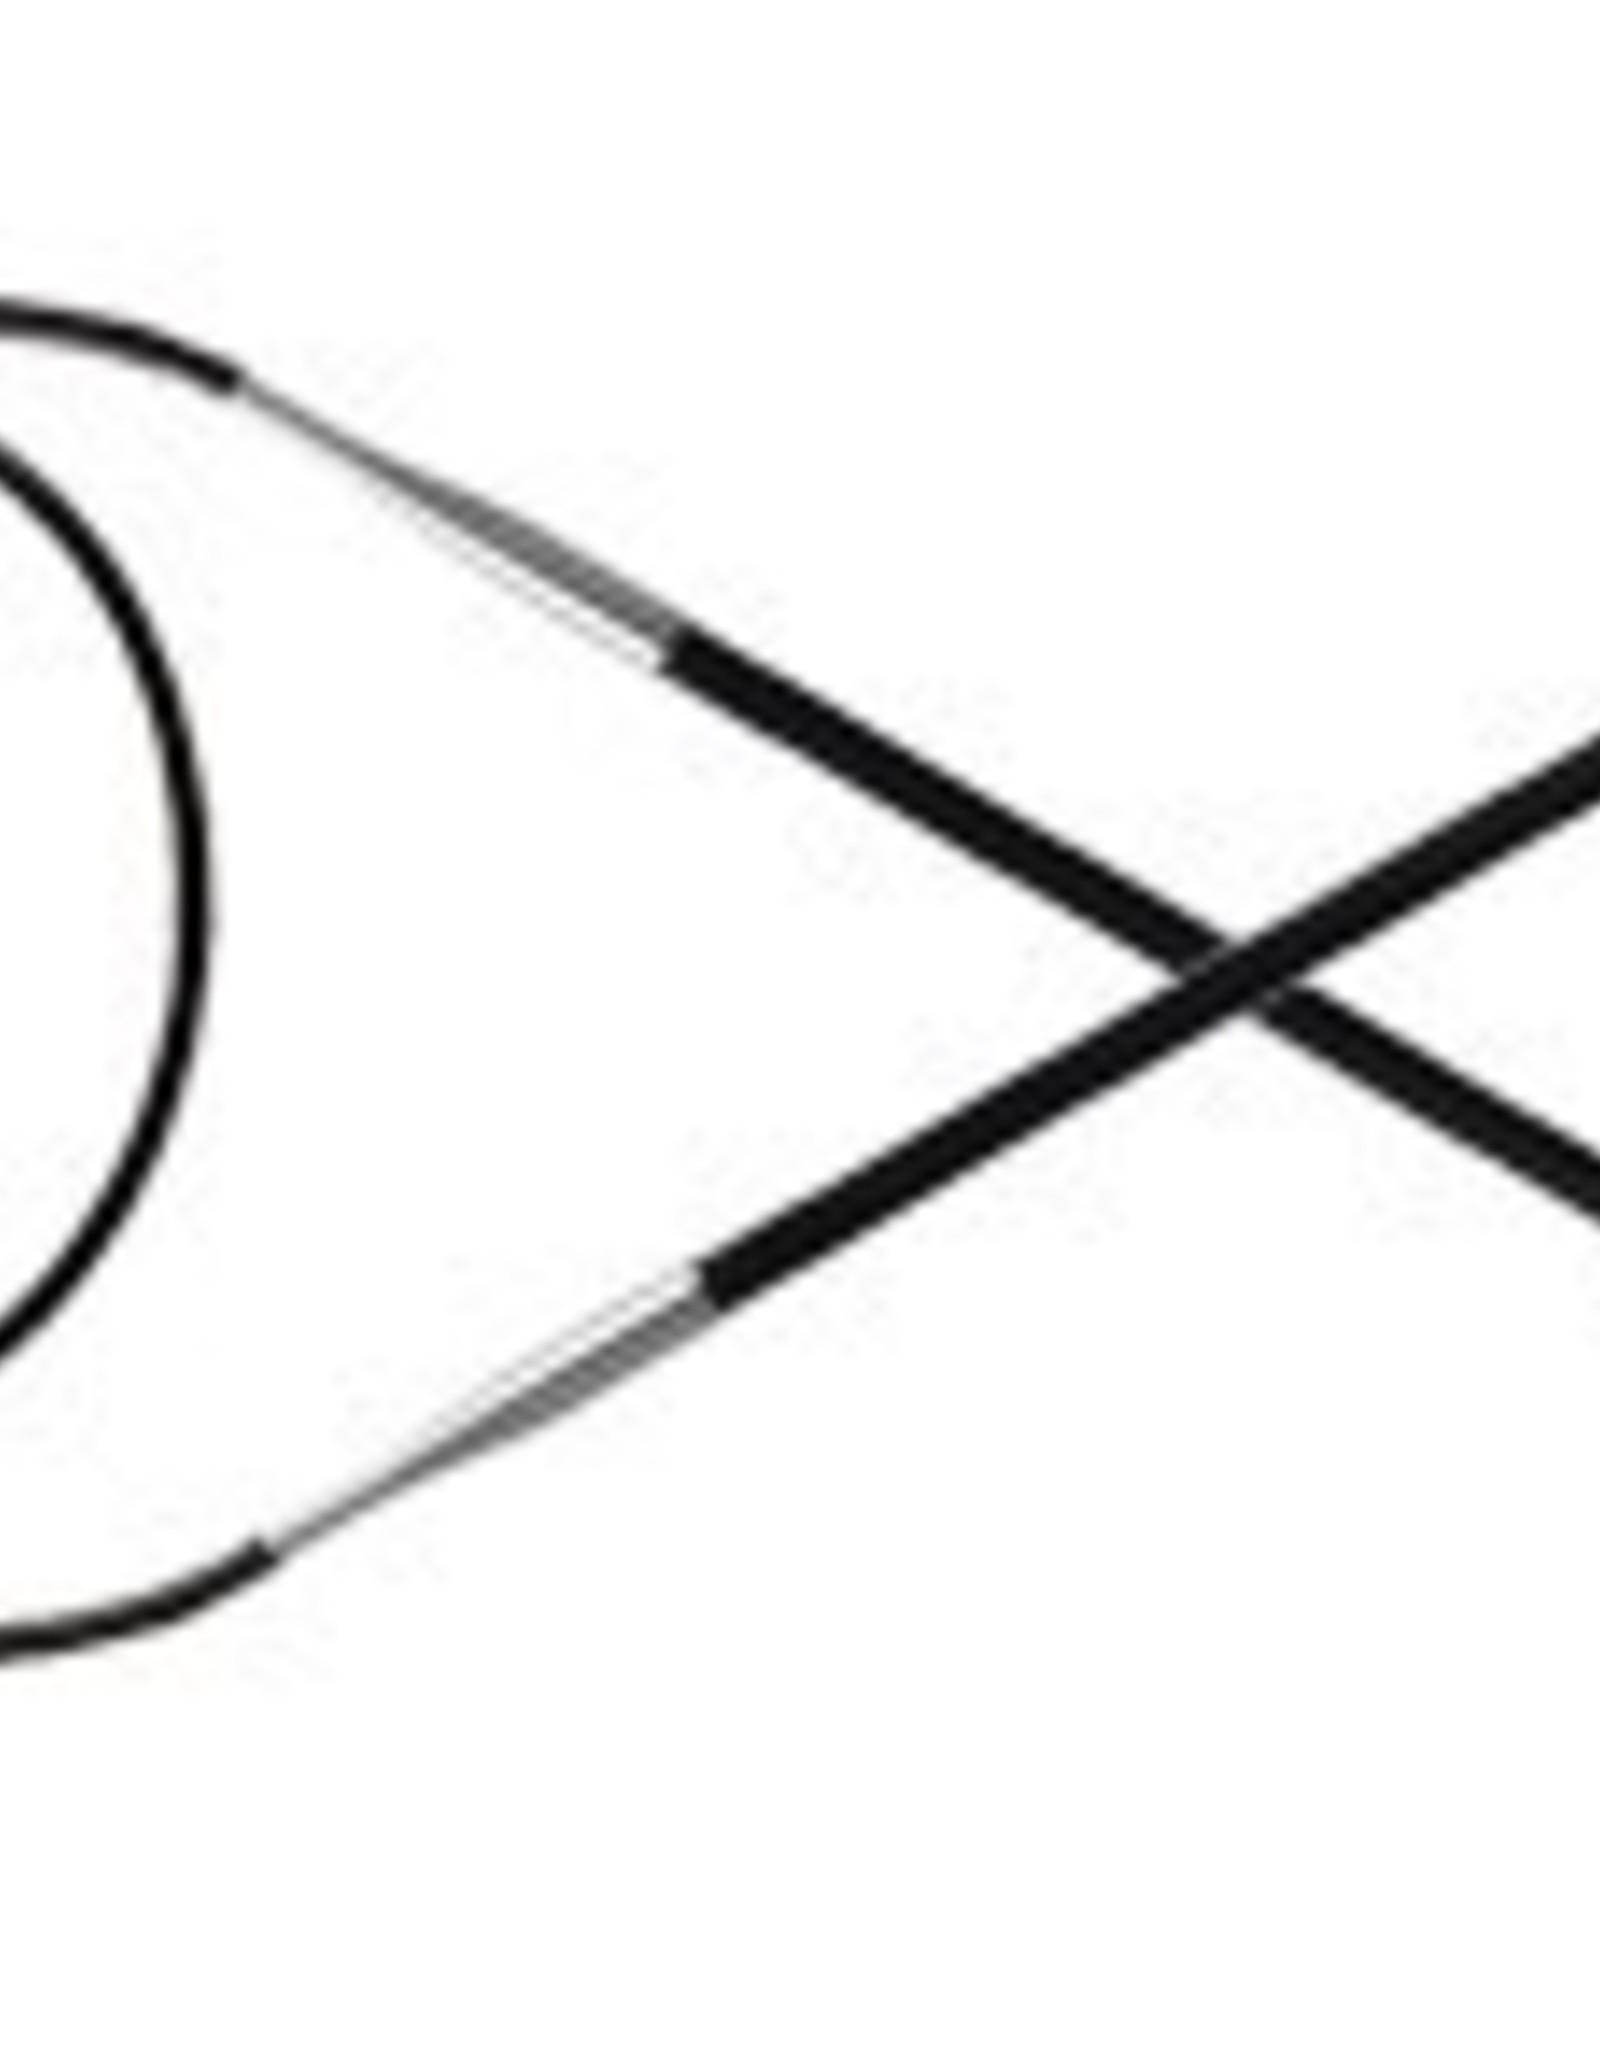 Knitter's Pride 0 Karbonz Circular 32